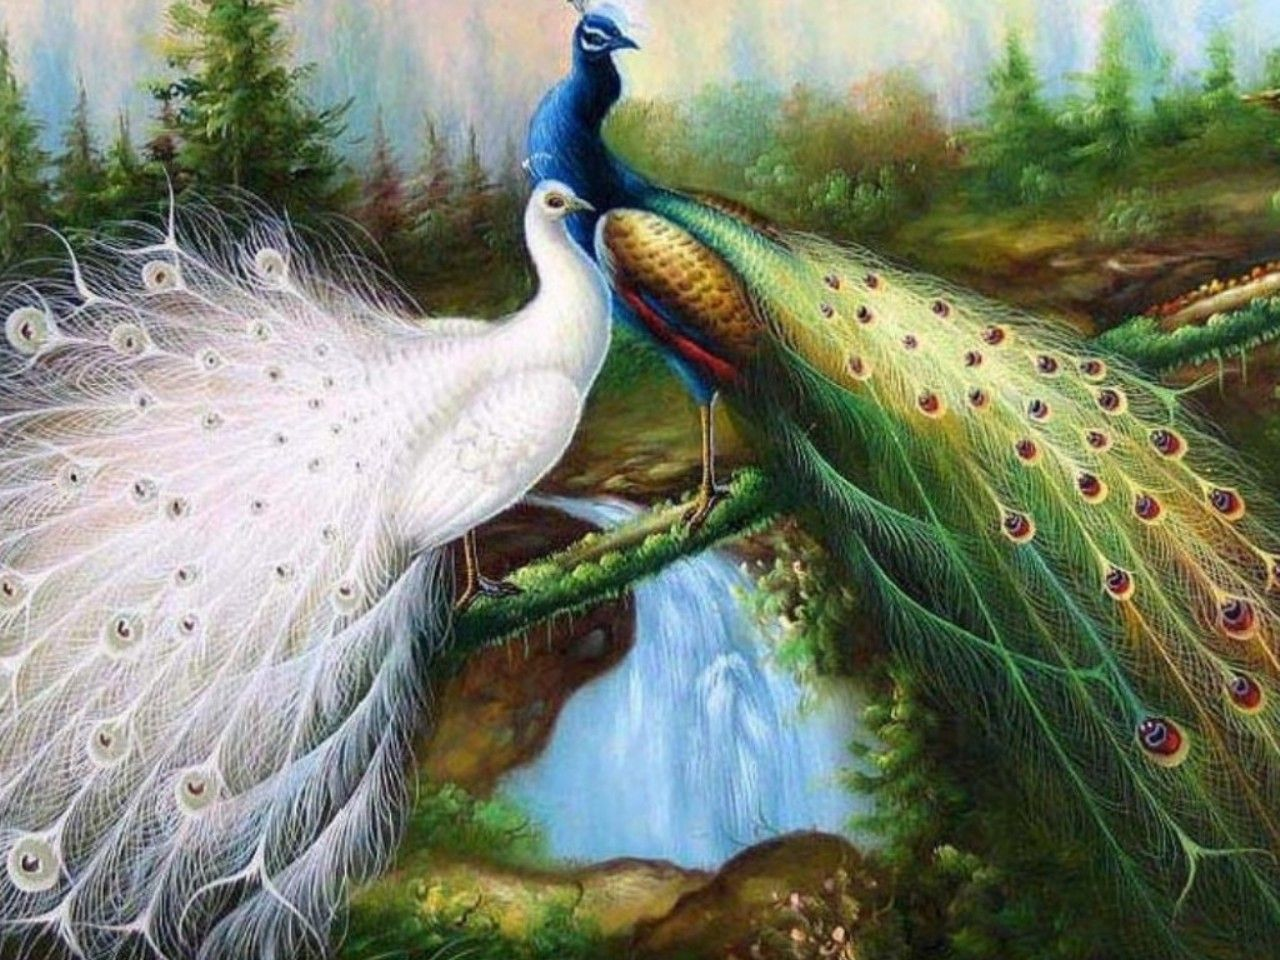 Peacock Bing Images Peacock Pictures Peacock Wallpaper Bird Wallpaper